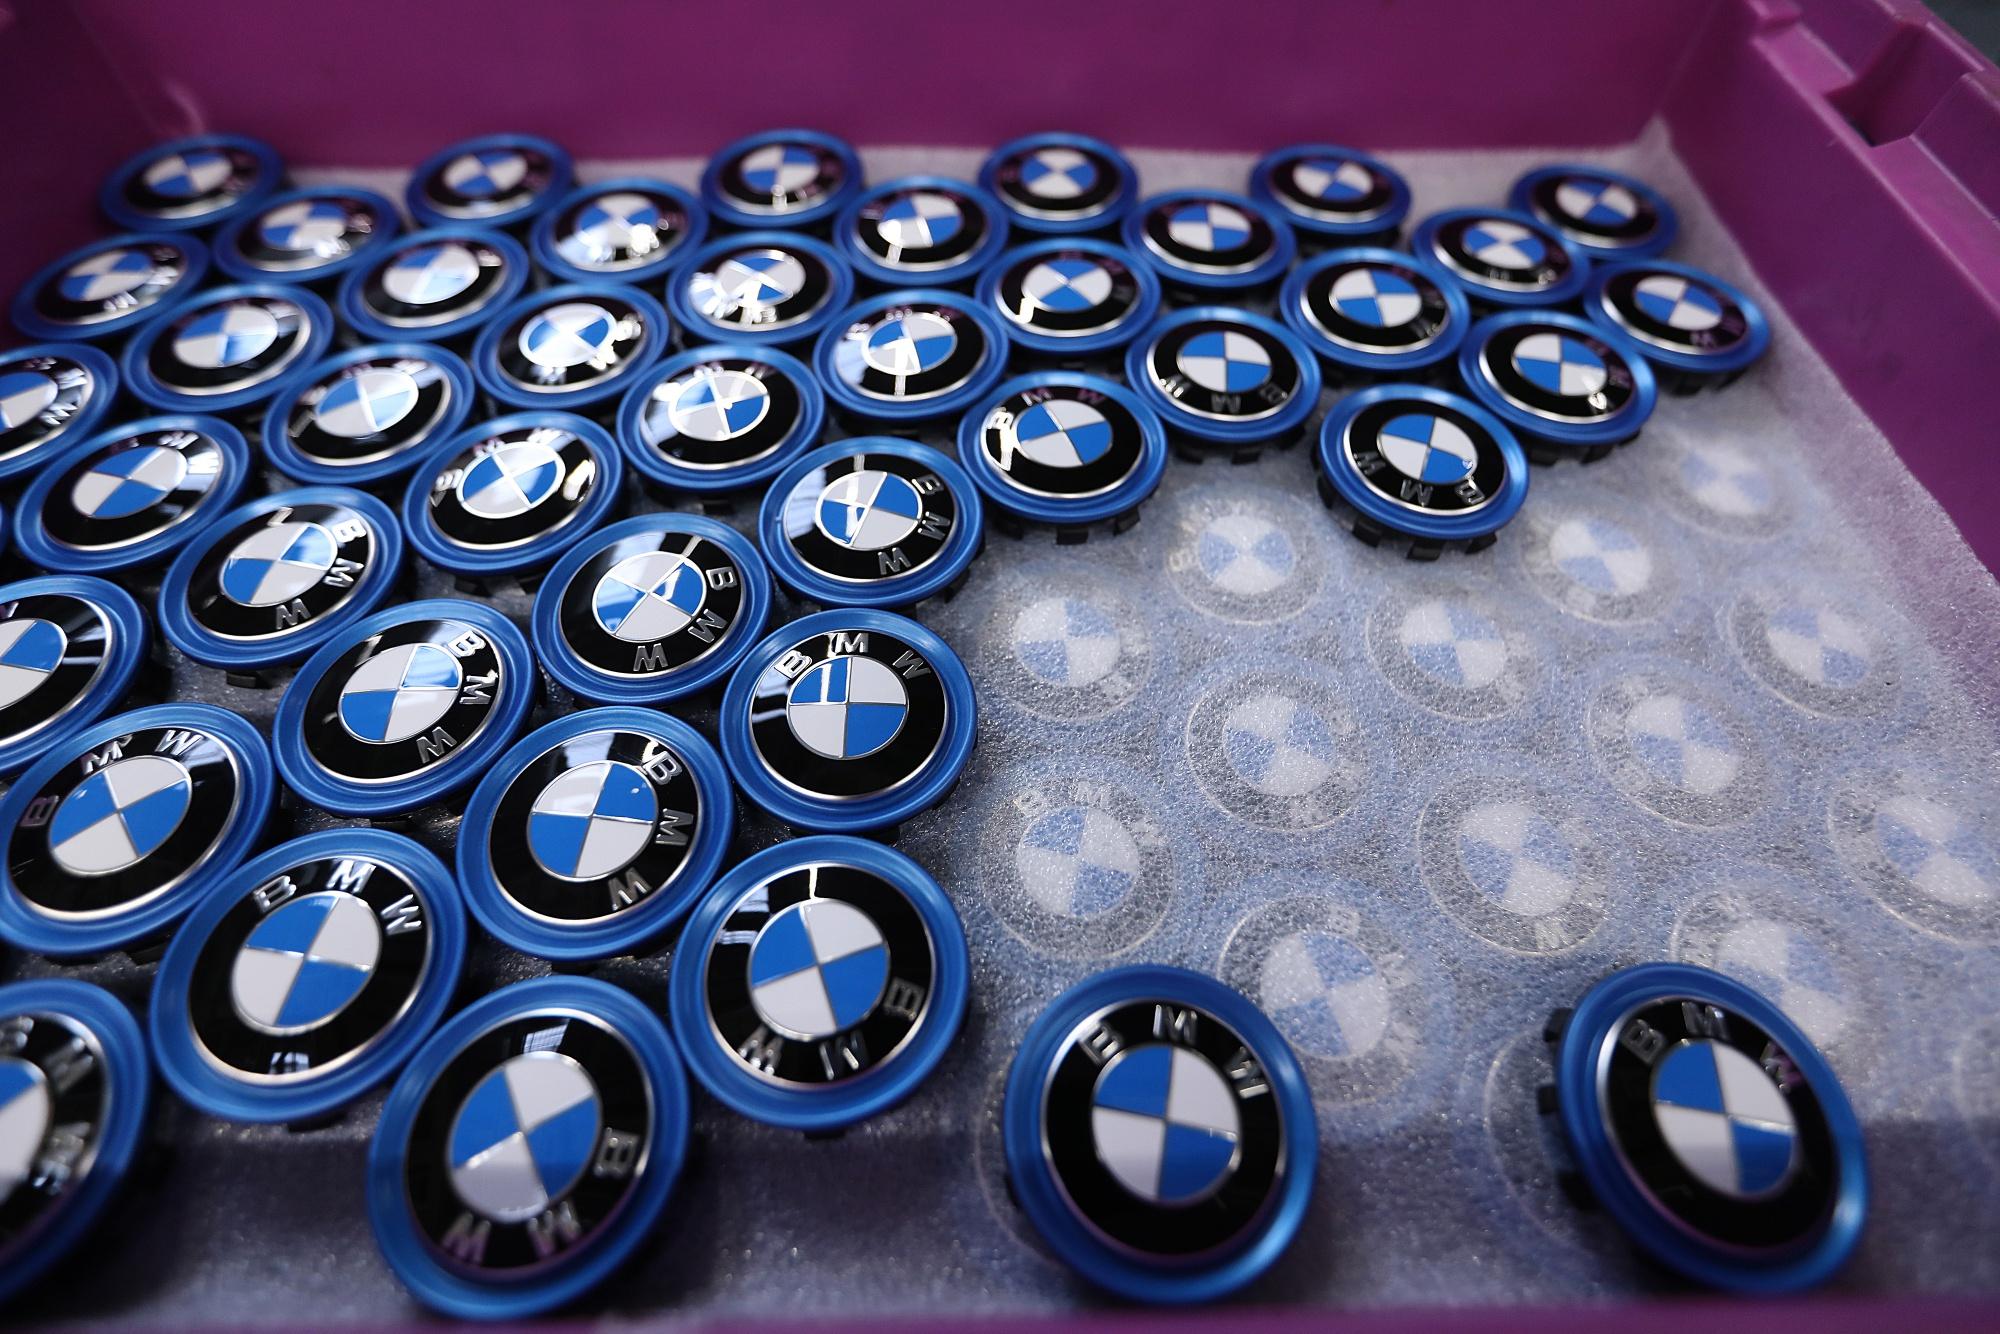 bloomberg.com - Oliver Sachgau - BMW Warns of Profit Slump and Sets a $25 Billion Savings Plan